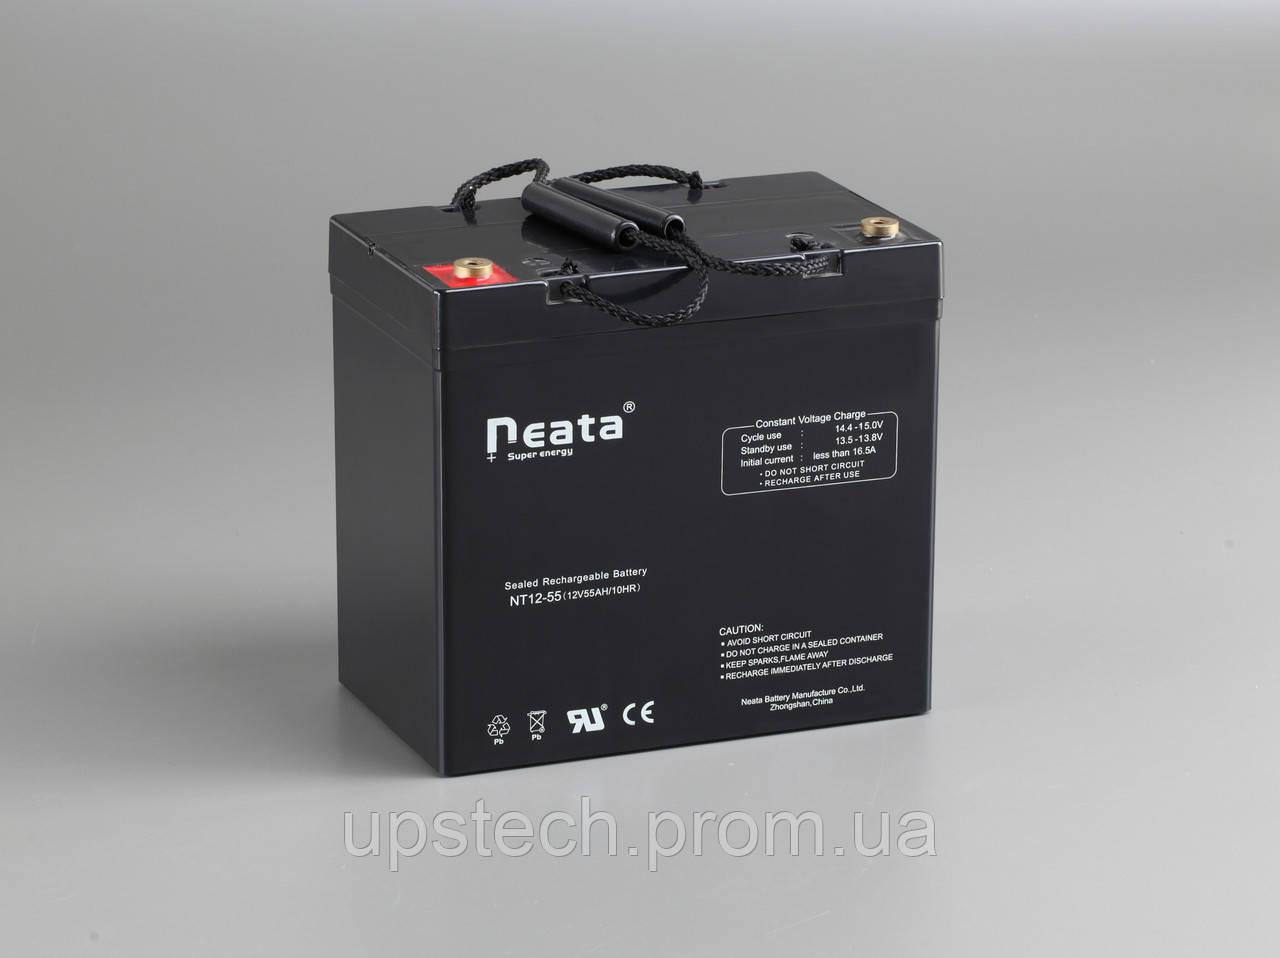 Аккумулятор NEATA 12V 55 Ah для UPS ибп